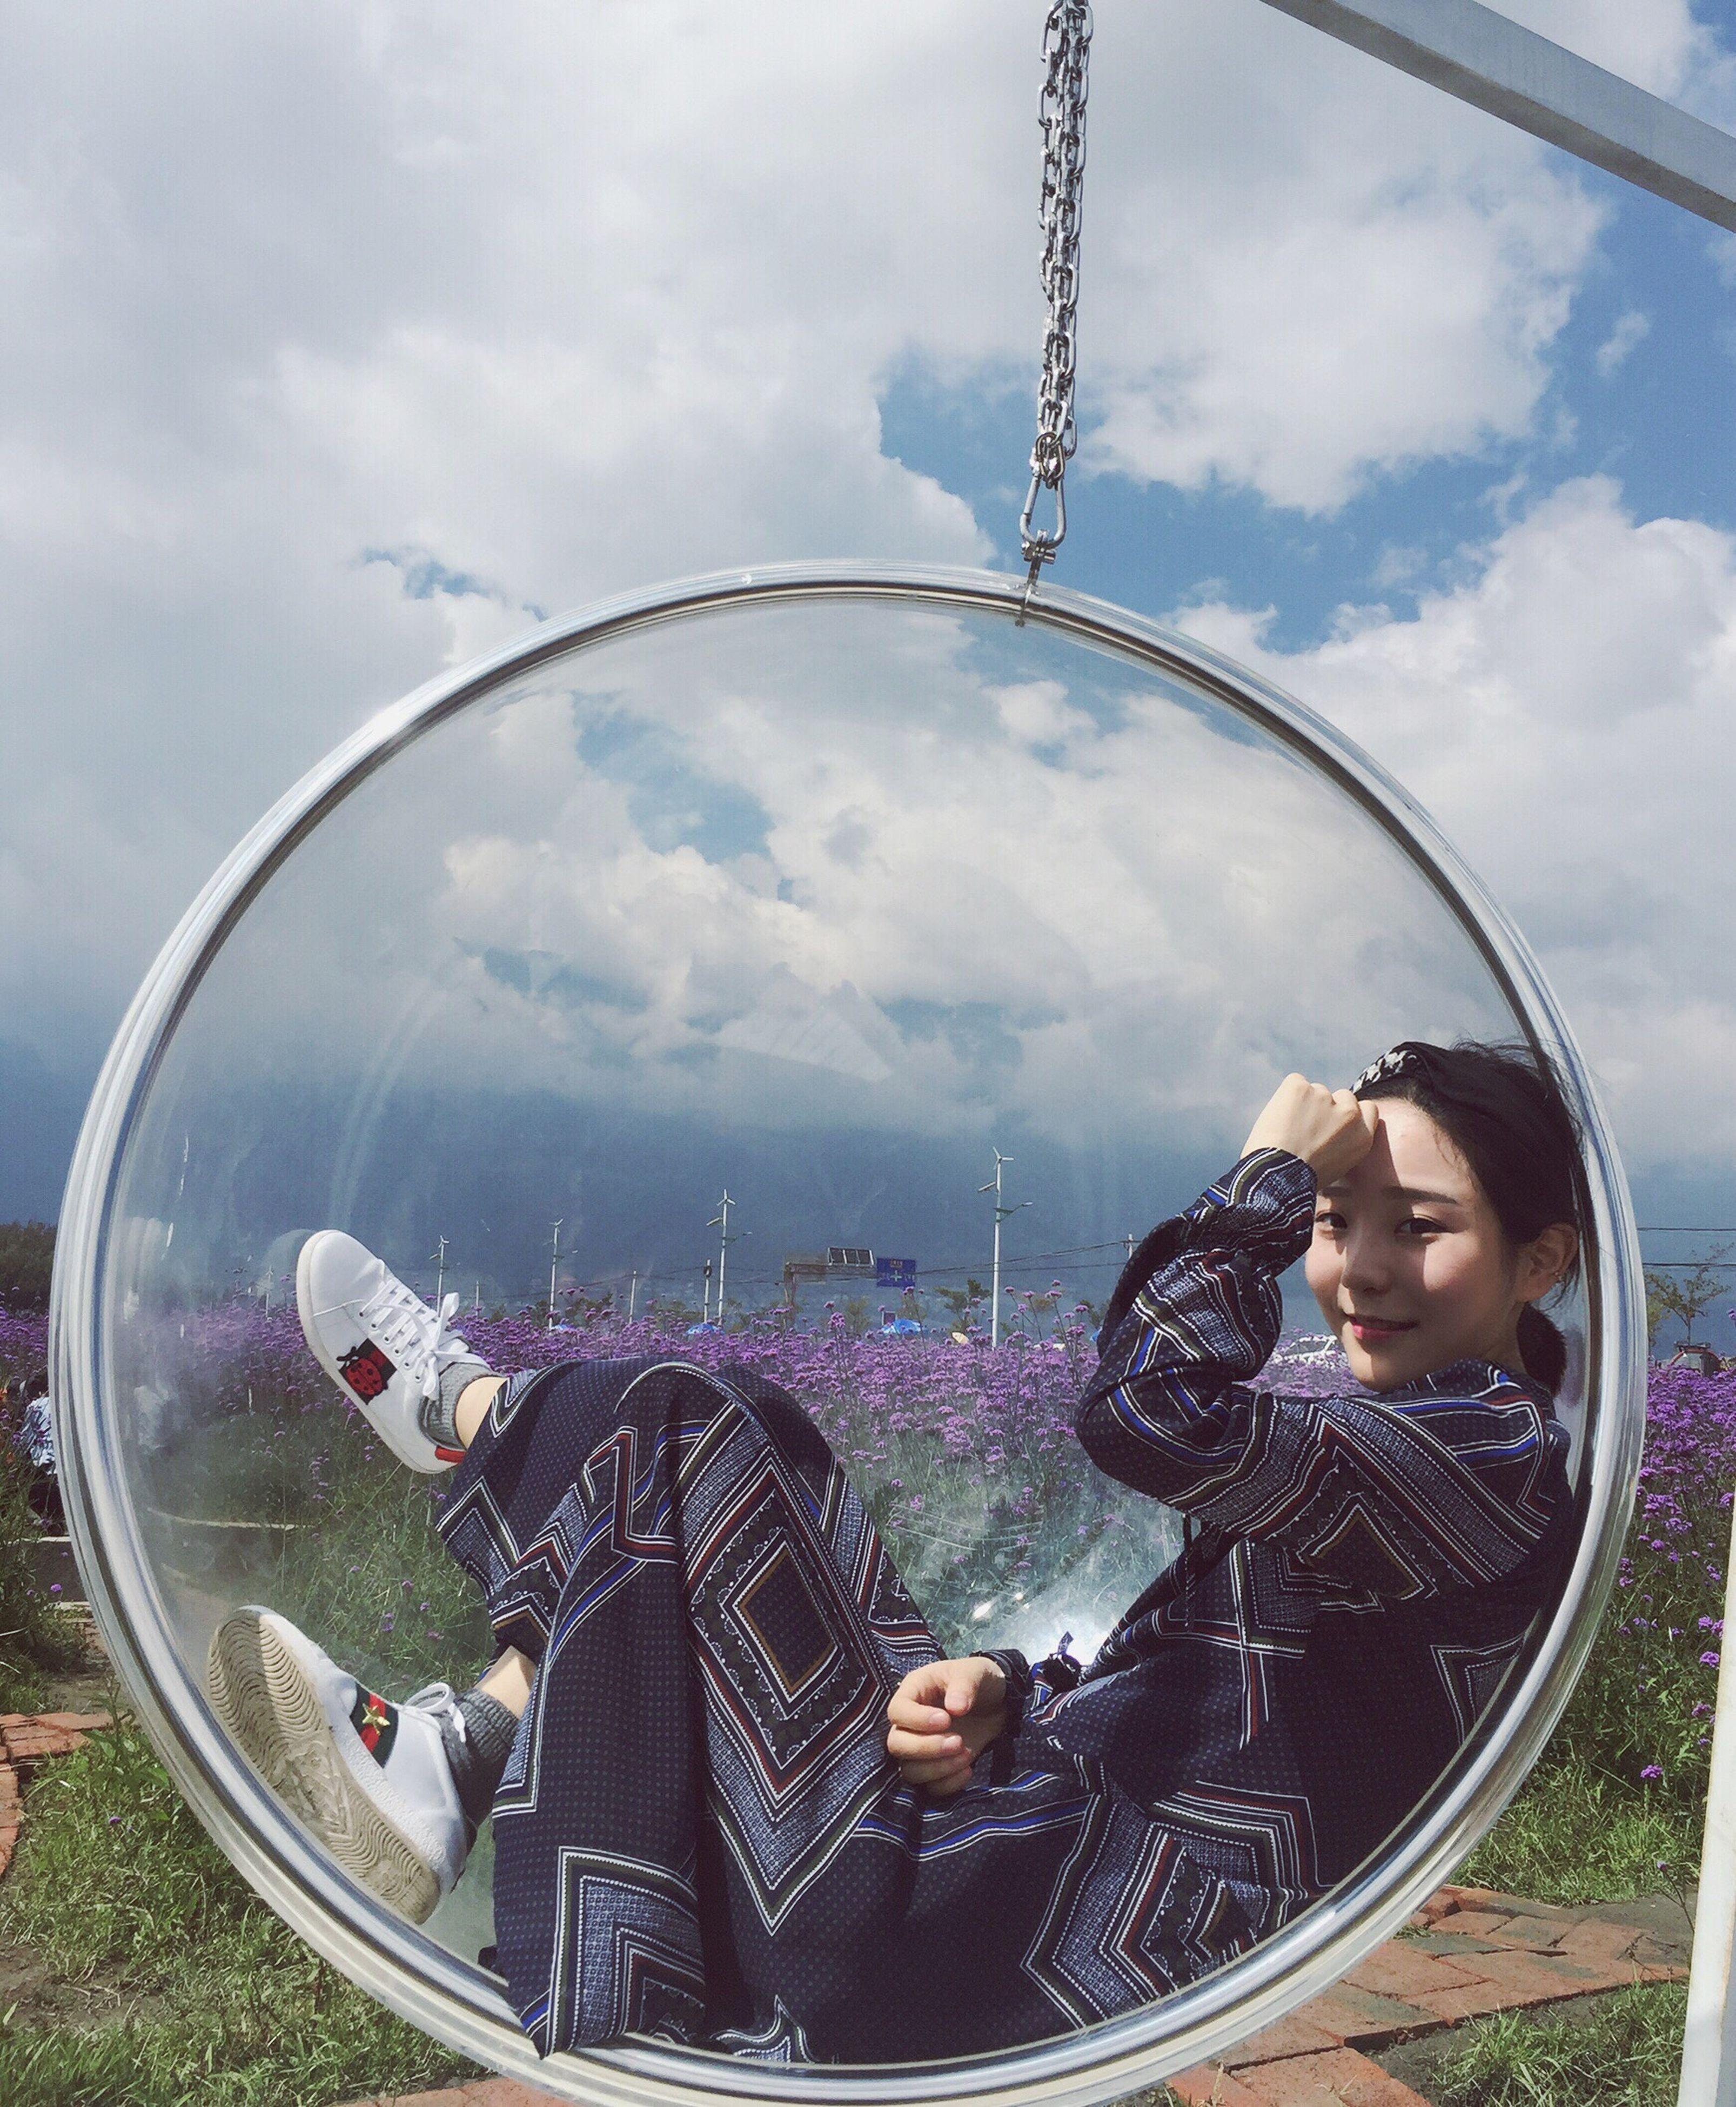 leisure activity, lifestyles, sky, cloud - sky, friendship, day, person, nature, tourism